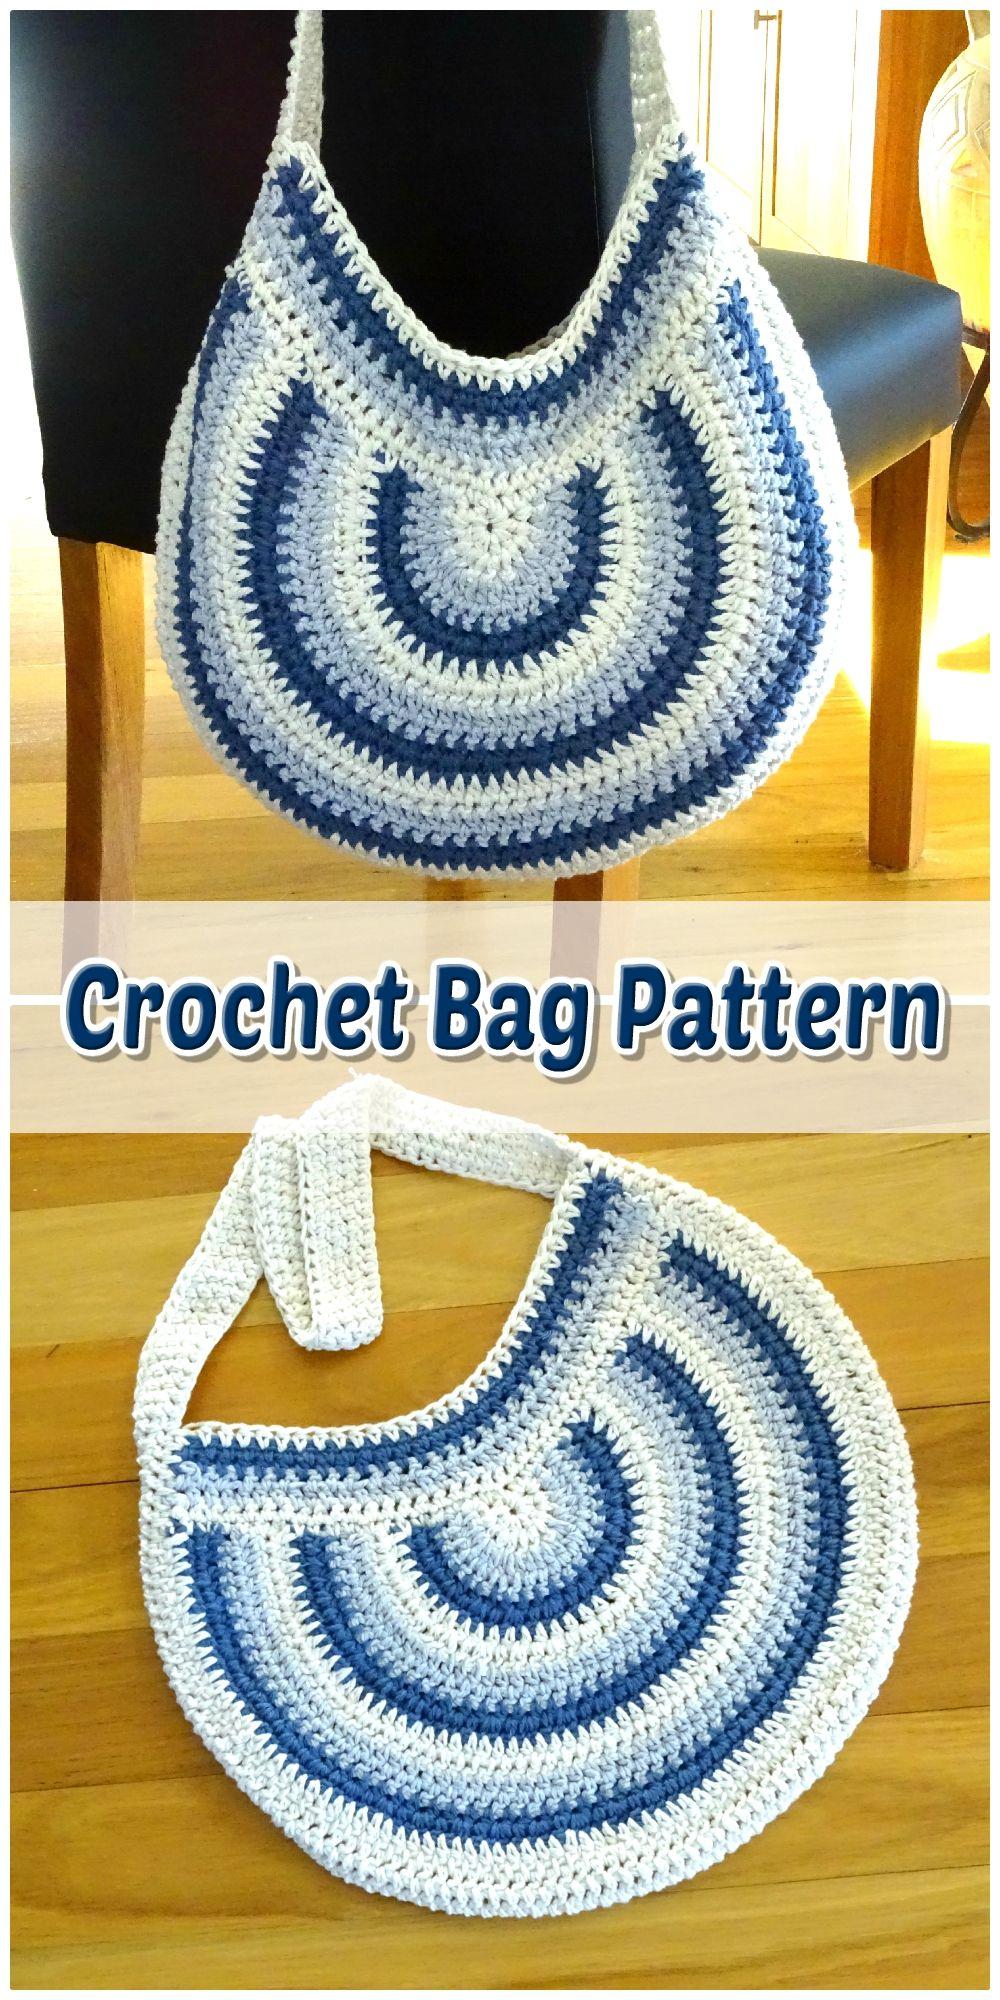 make you own DIY crochet tote bag purse how to beginner crochet starter kit crochet handbag tutorial Crochet cotton BAG PDF pattern